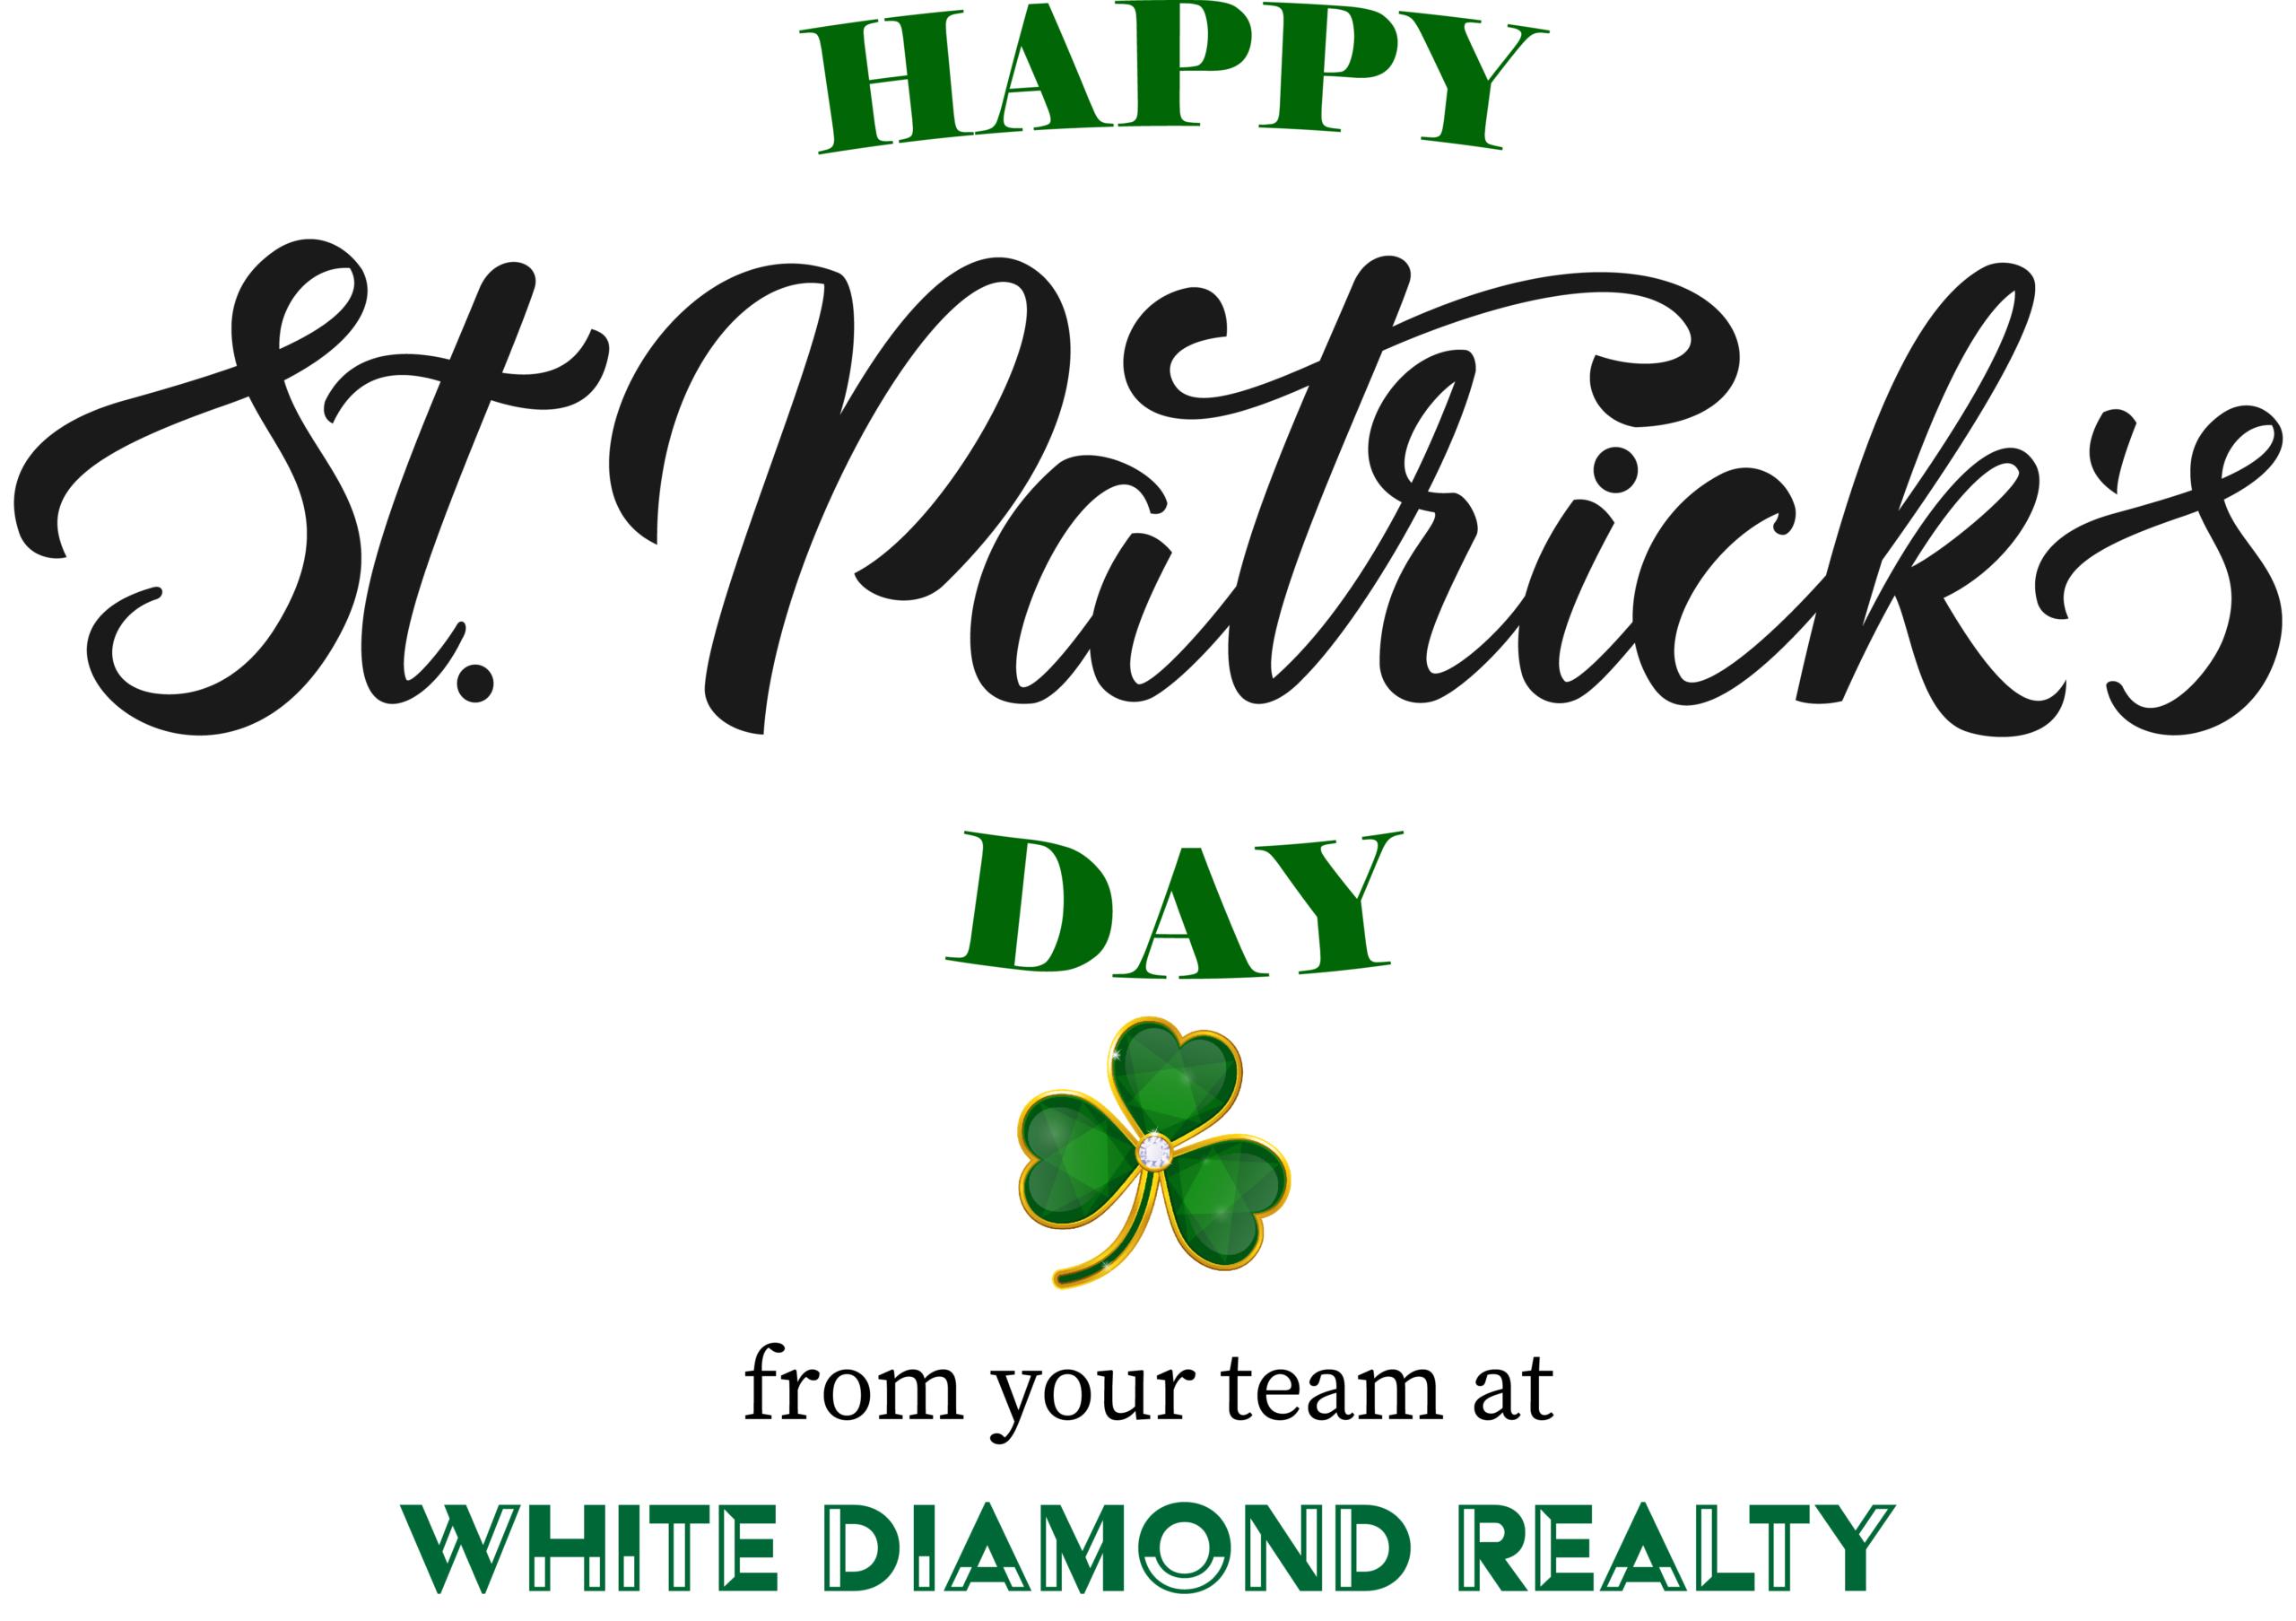 Happy St. Patrick's Day from White Diamond